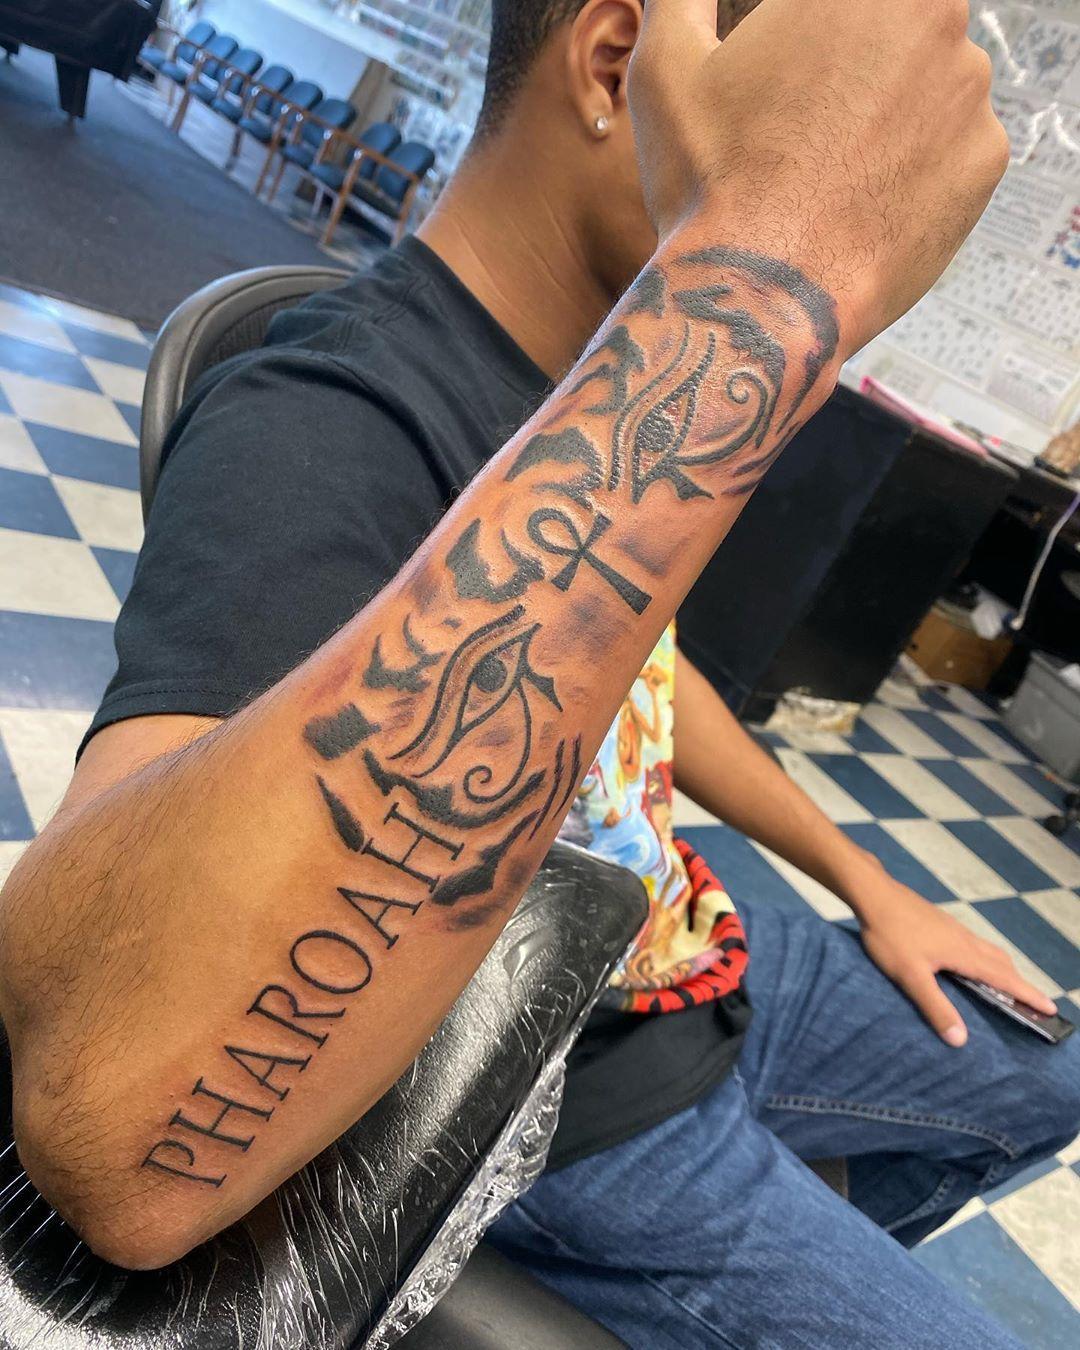 Outdoor Tattoo Outdoor Tattoo Tattoos Forearm Sleeve Tattoos